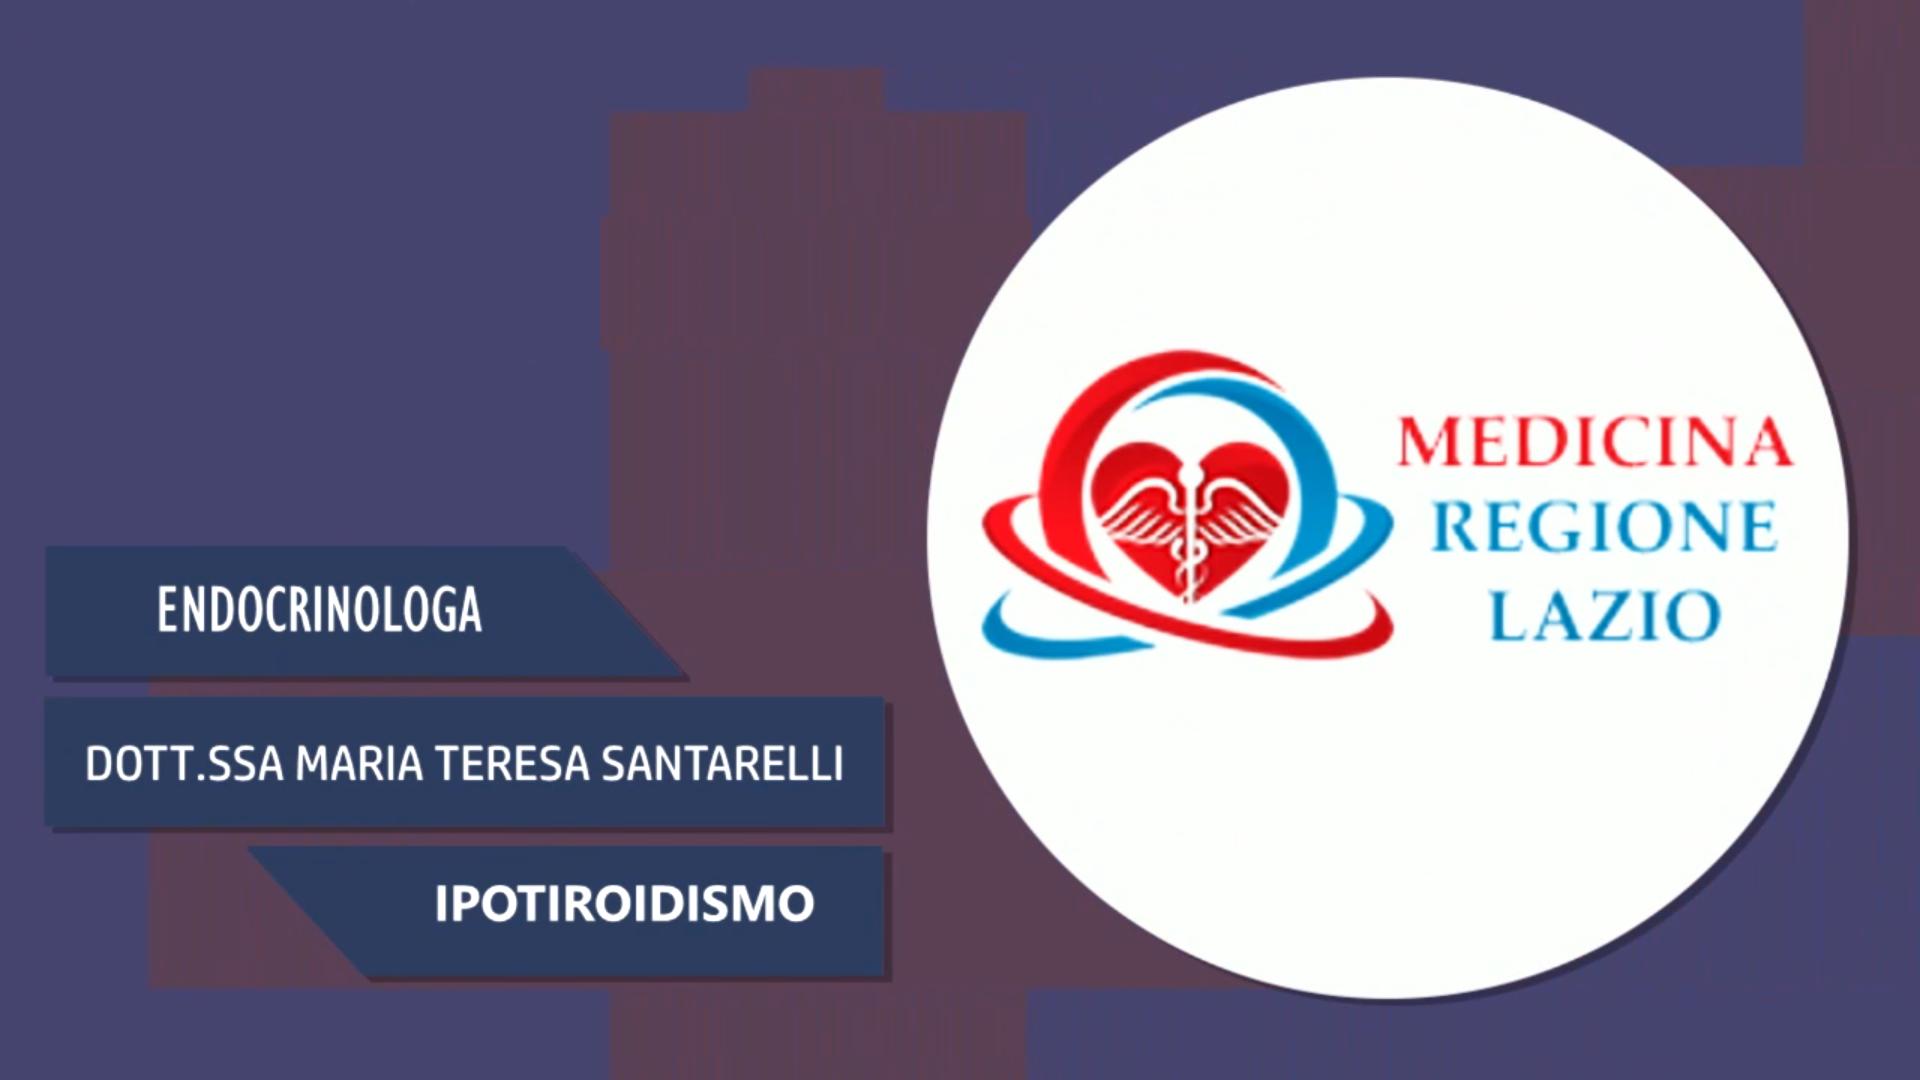 Intervista alla Dott.ssa Maria Teresa Santarelli – Ipotiroidismo